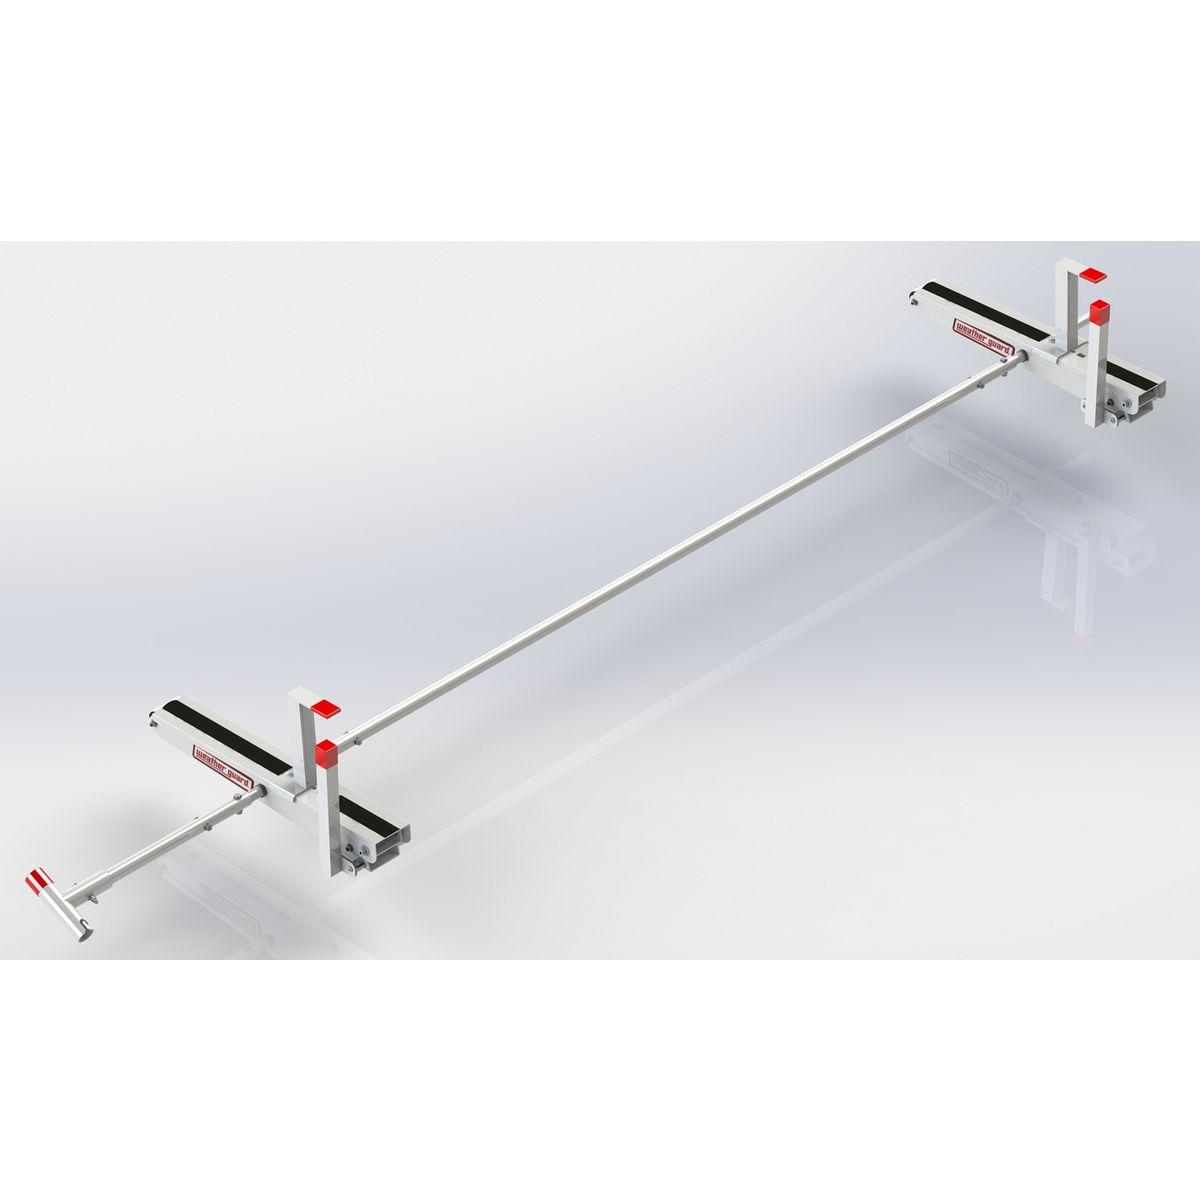 Model 2275 3 01 Ezglide2 Fixed Drop Down Ladder Kit Full